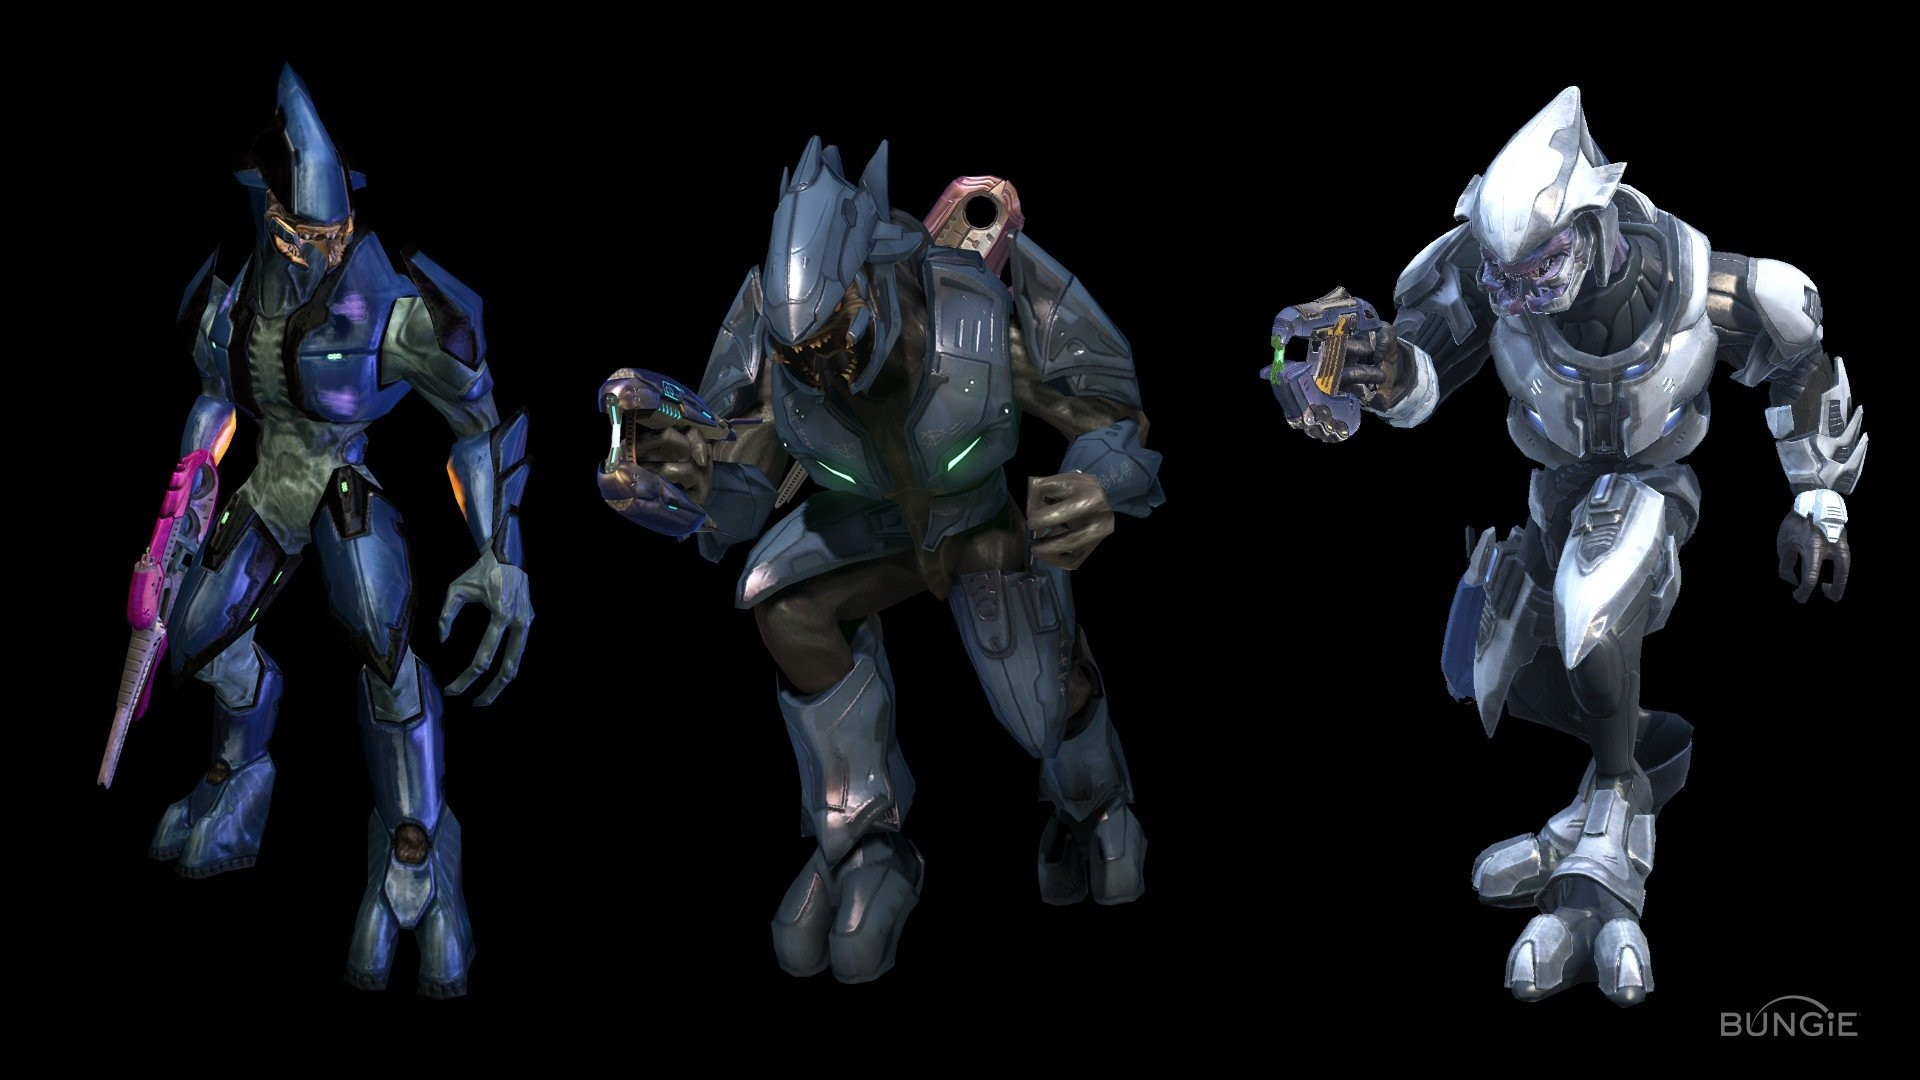 Halo elite Halo Reach science fiction comparisons Halo Ce Halo 2 elites  wallpaper     316121   WallpaperUP